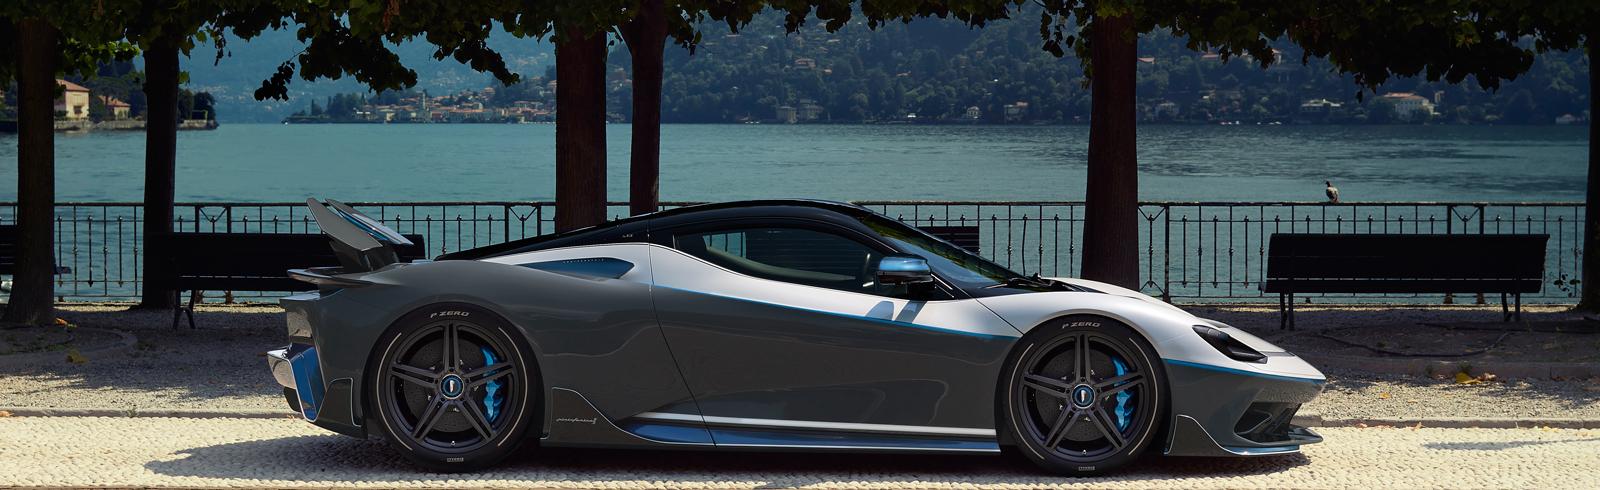 First production-ready Pininfarina Battista prepared for world debut at Monterey Car Week